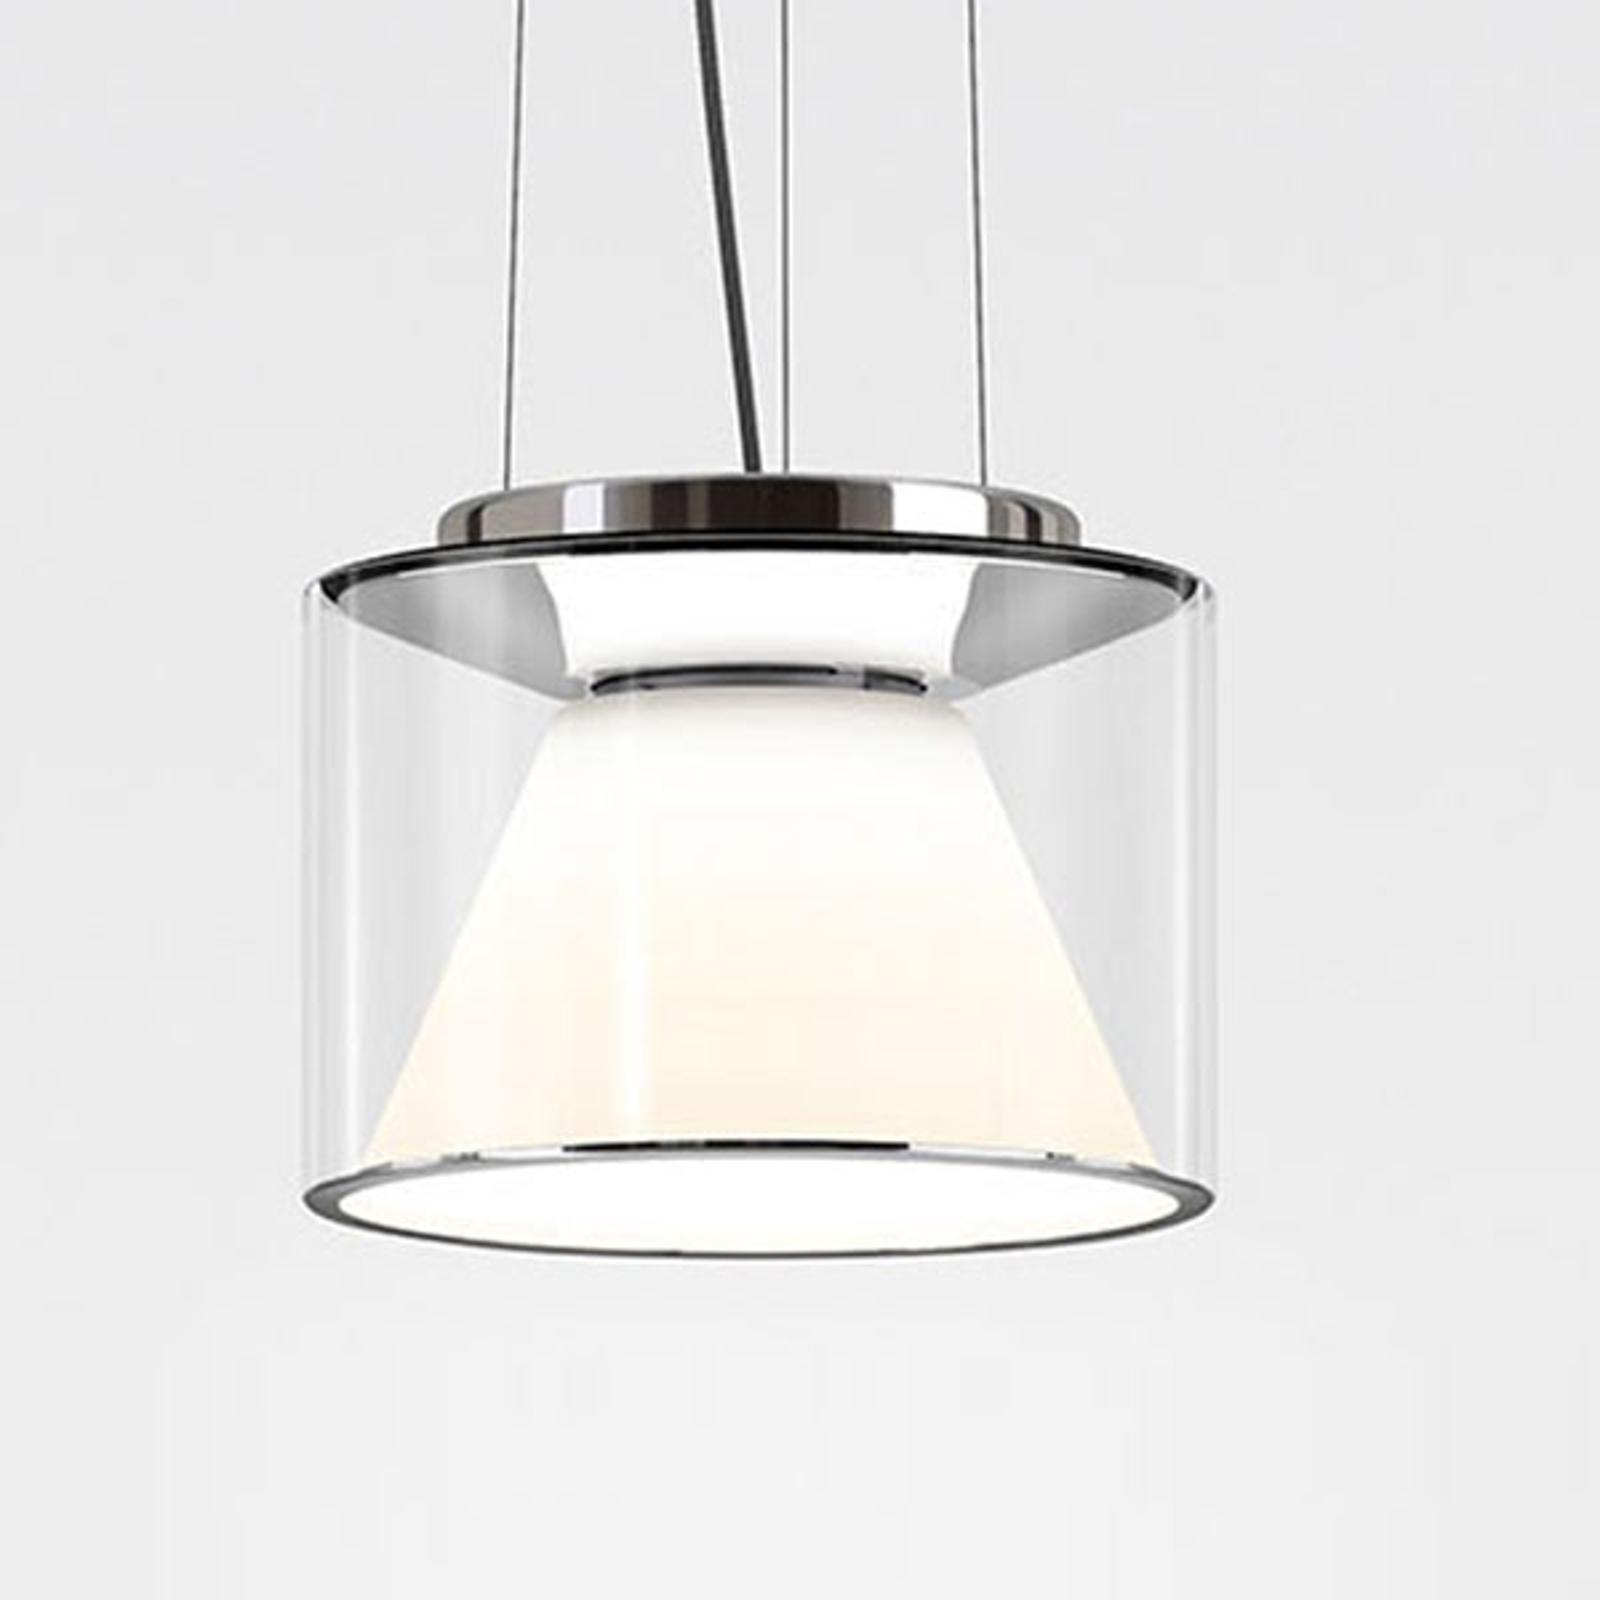 serien.lighting Drum S Pendel Seil 927 Triac flach